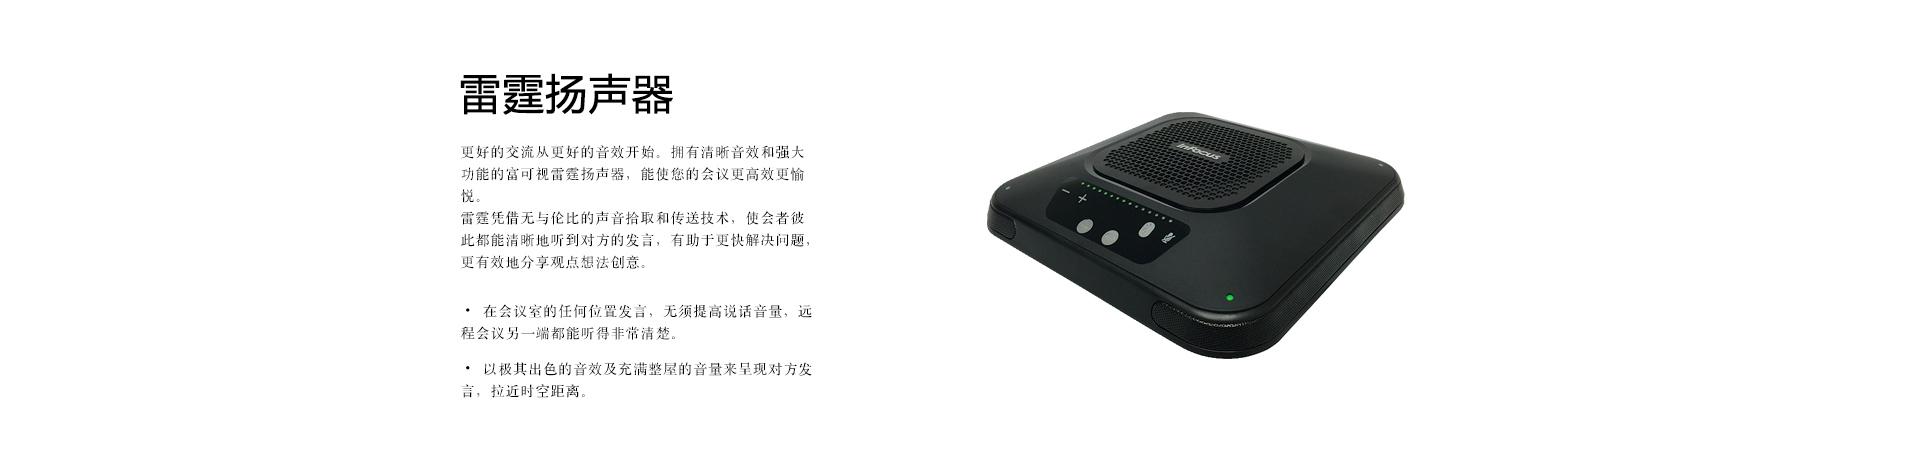 INA-TH150雷霆扬声器